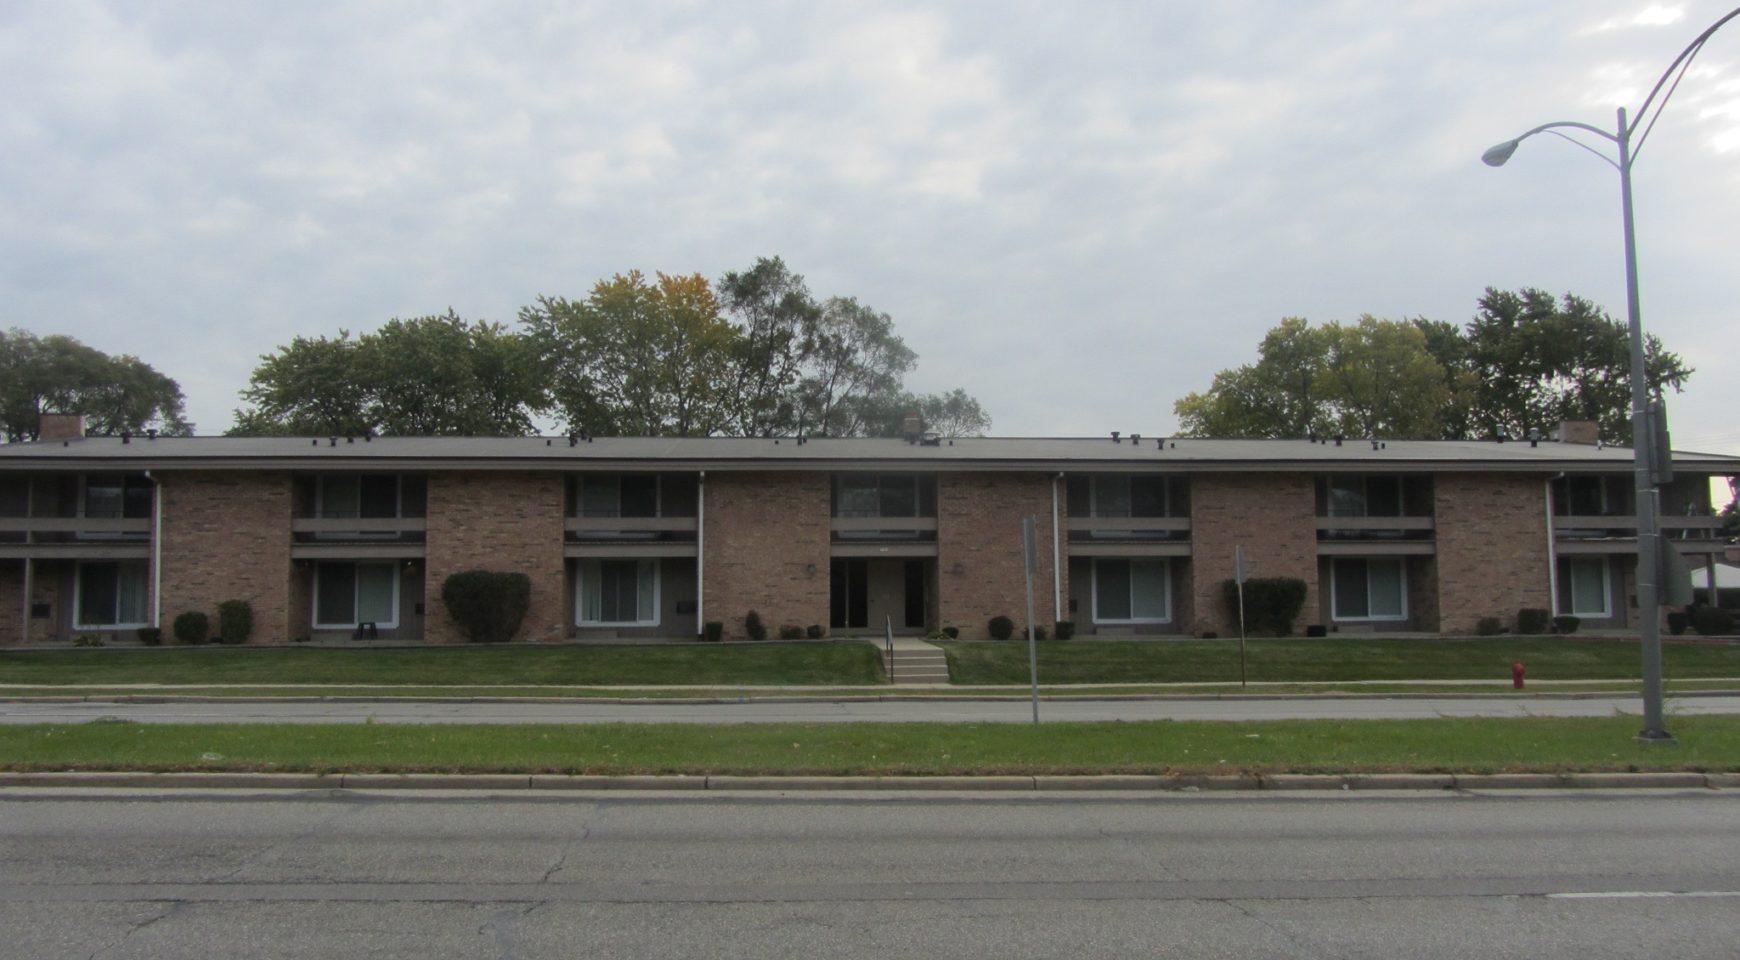 3 Bedroom Apartments In Milwaukee